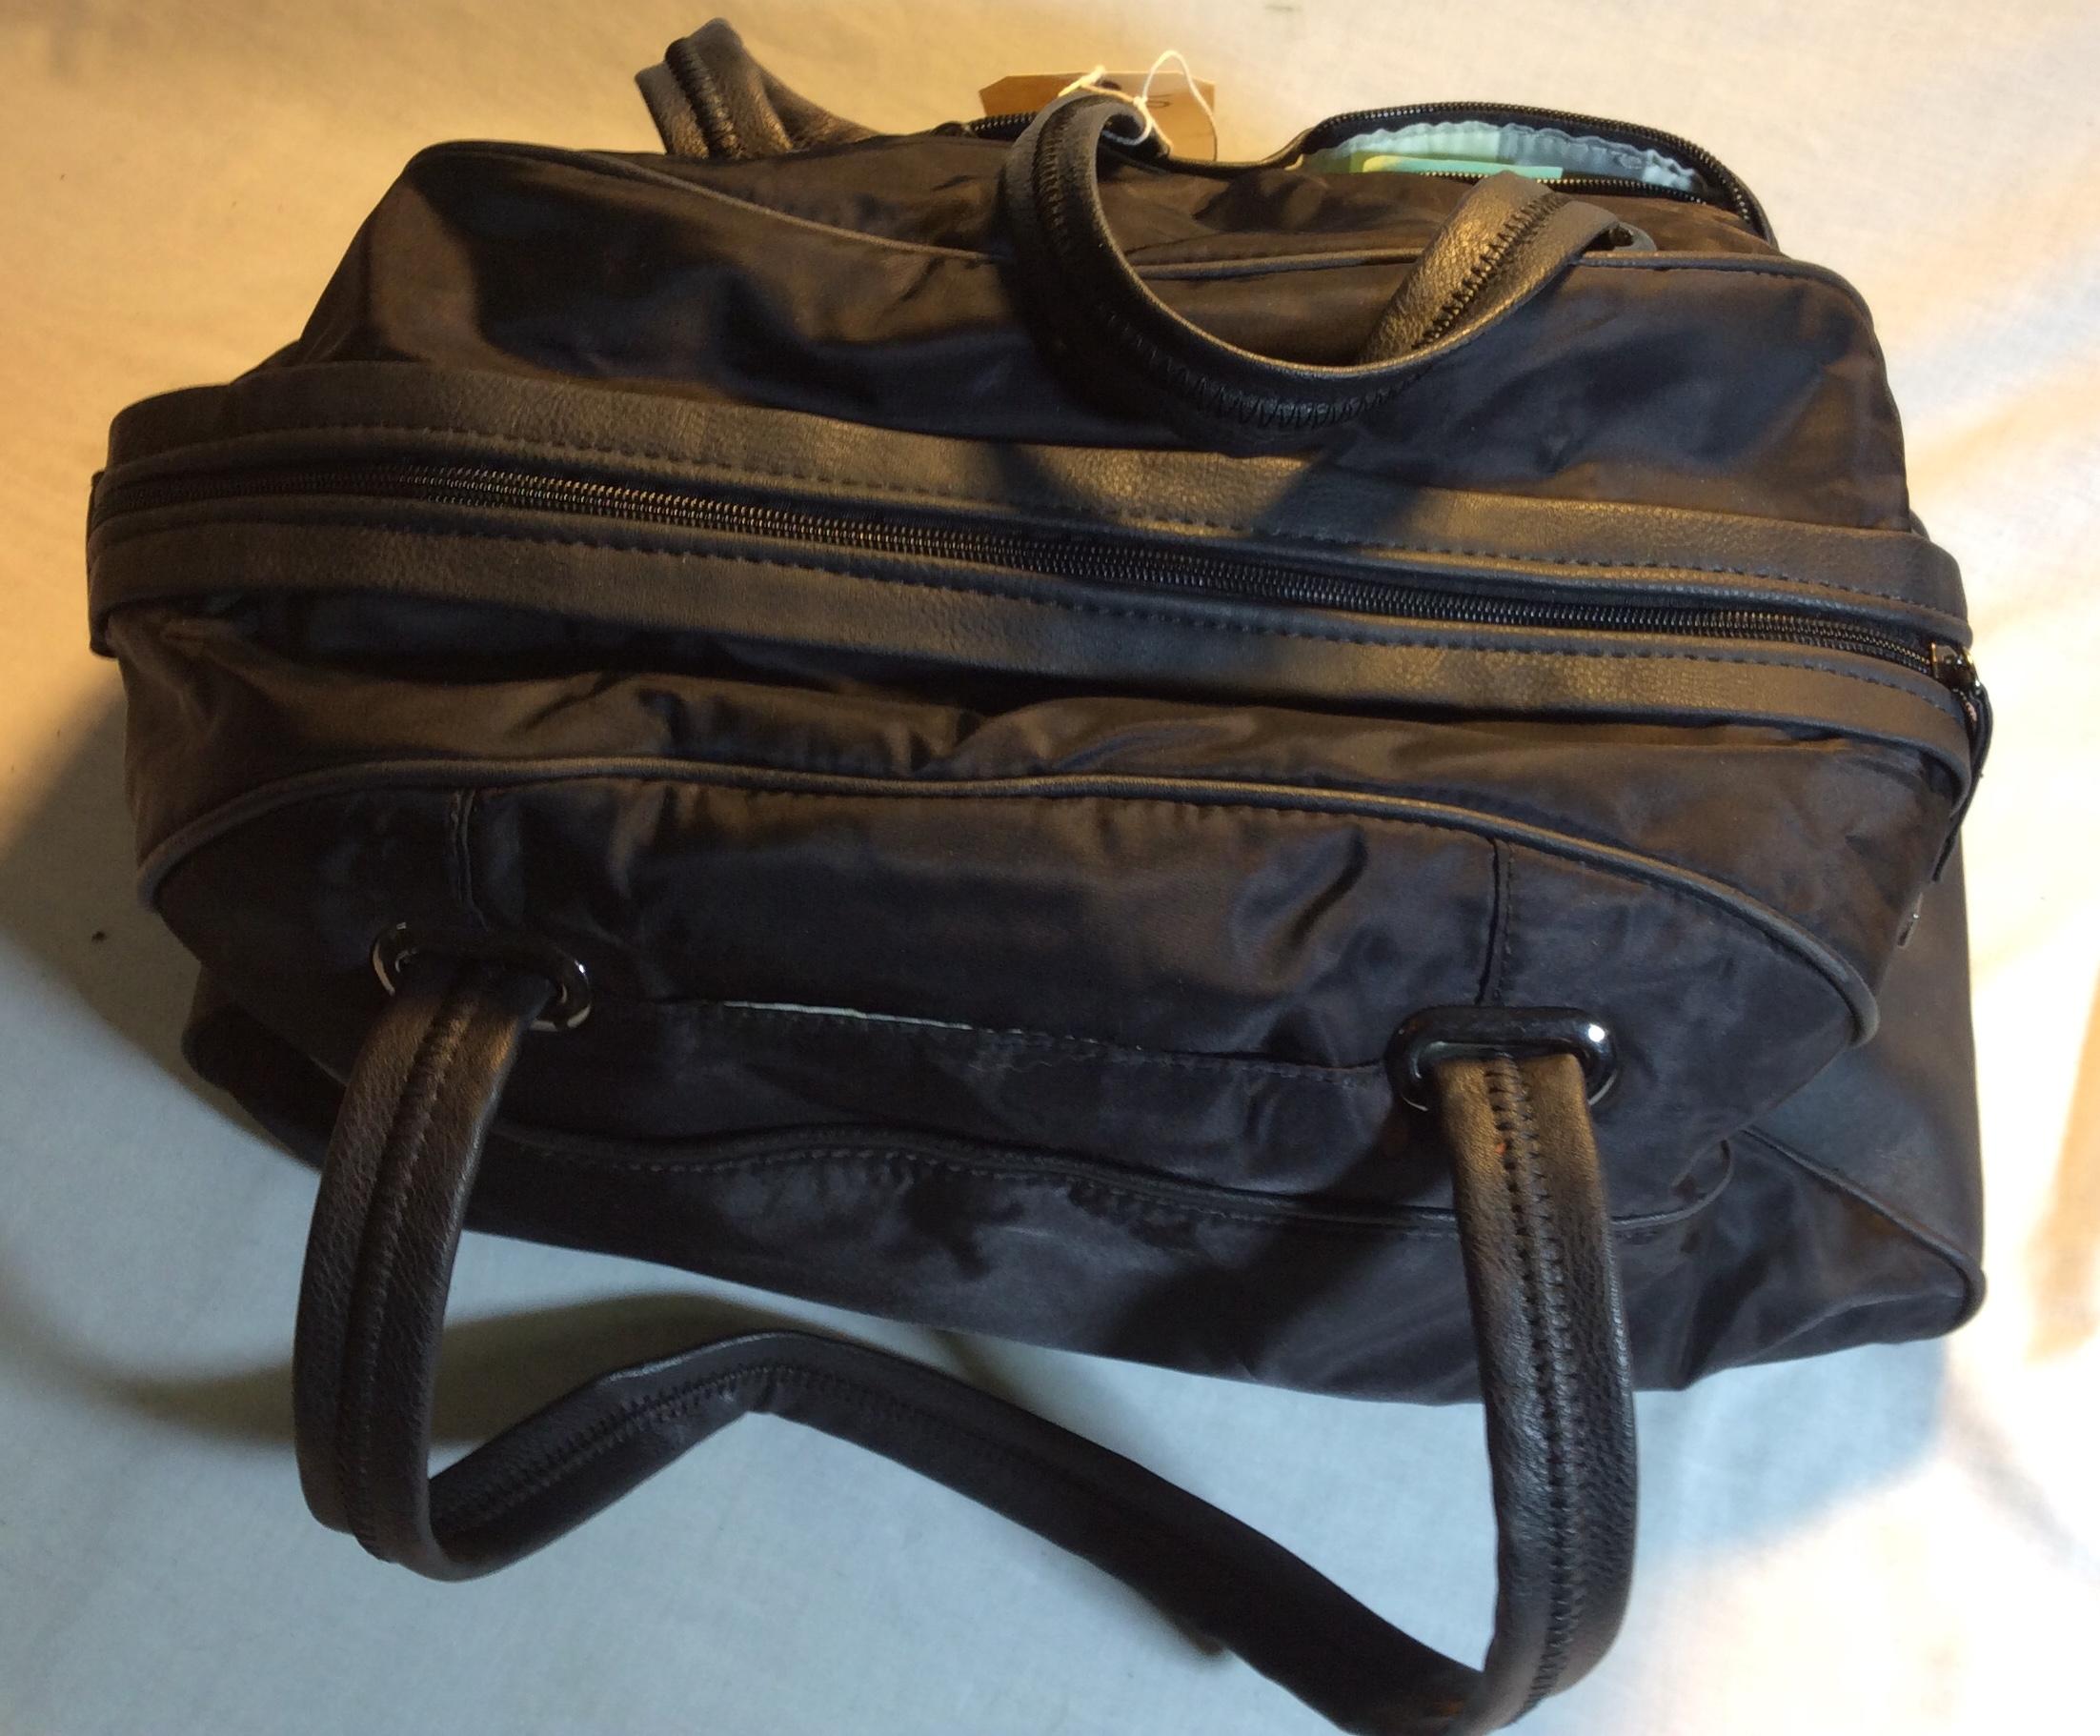 Black spirit gym bag